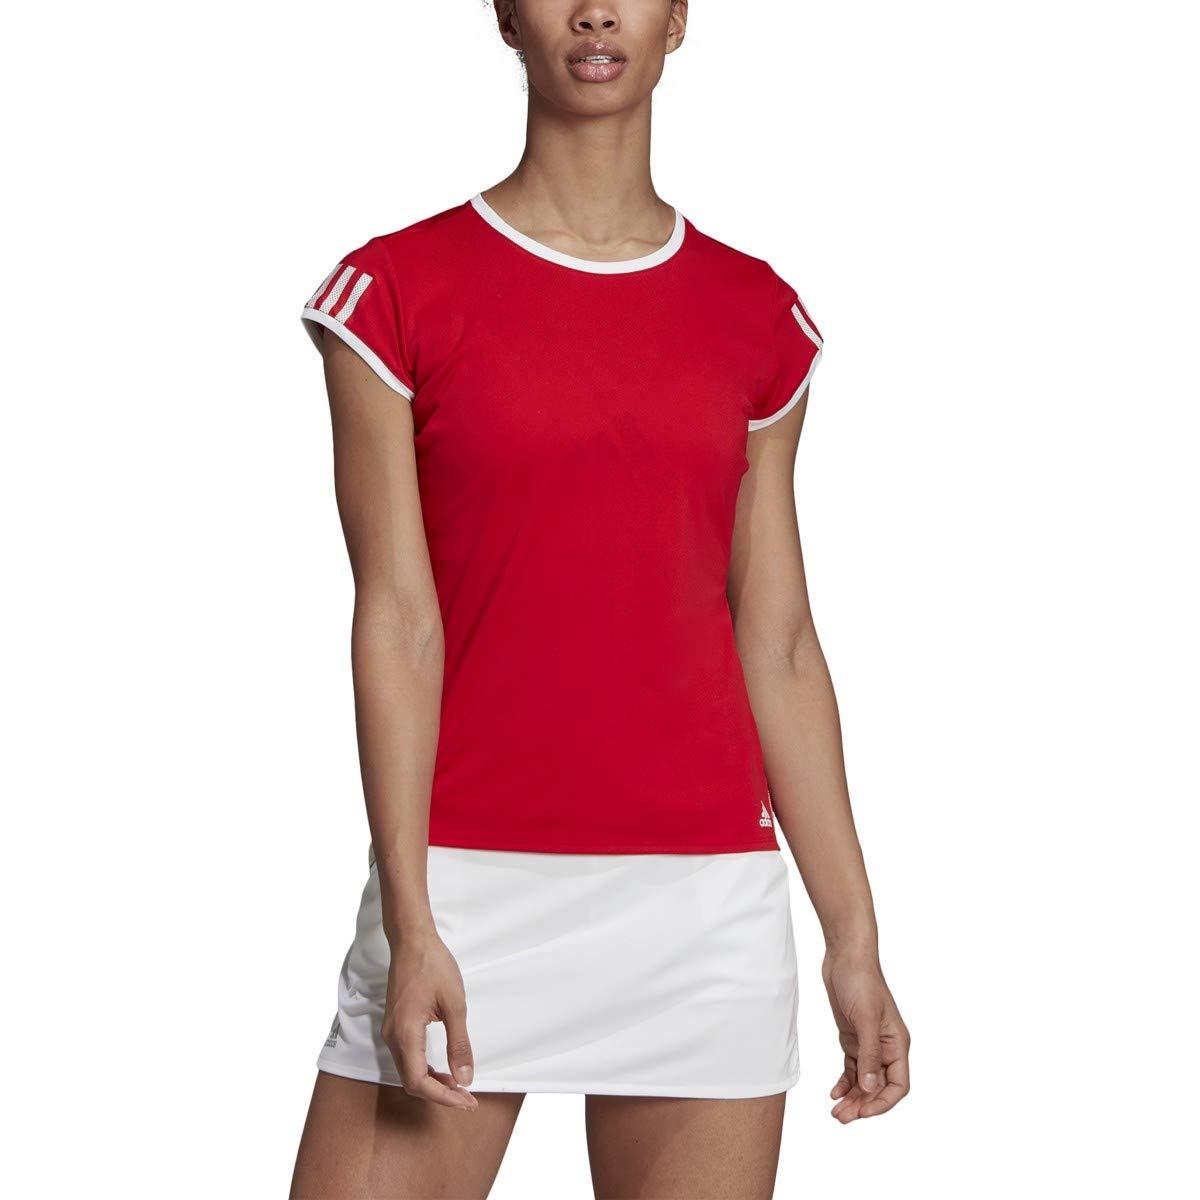 adidas Club 3-Stripes Tennis Tee, Scarlet, X-Small